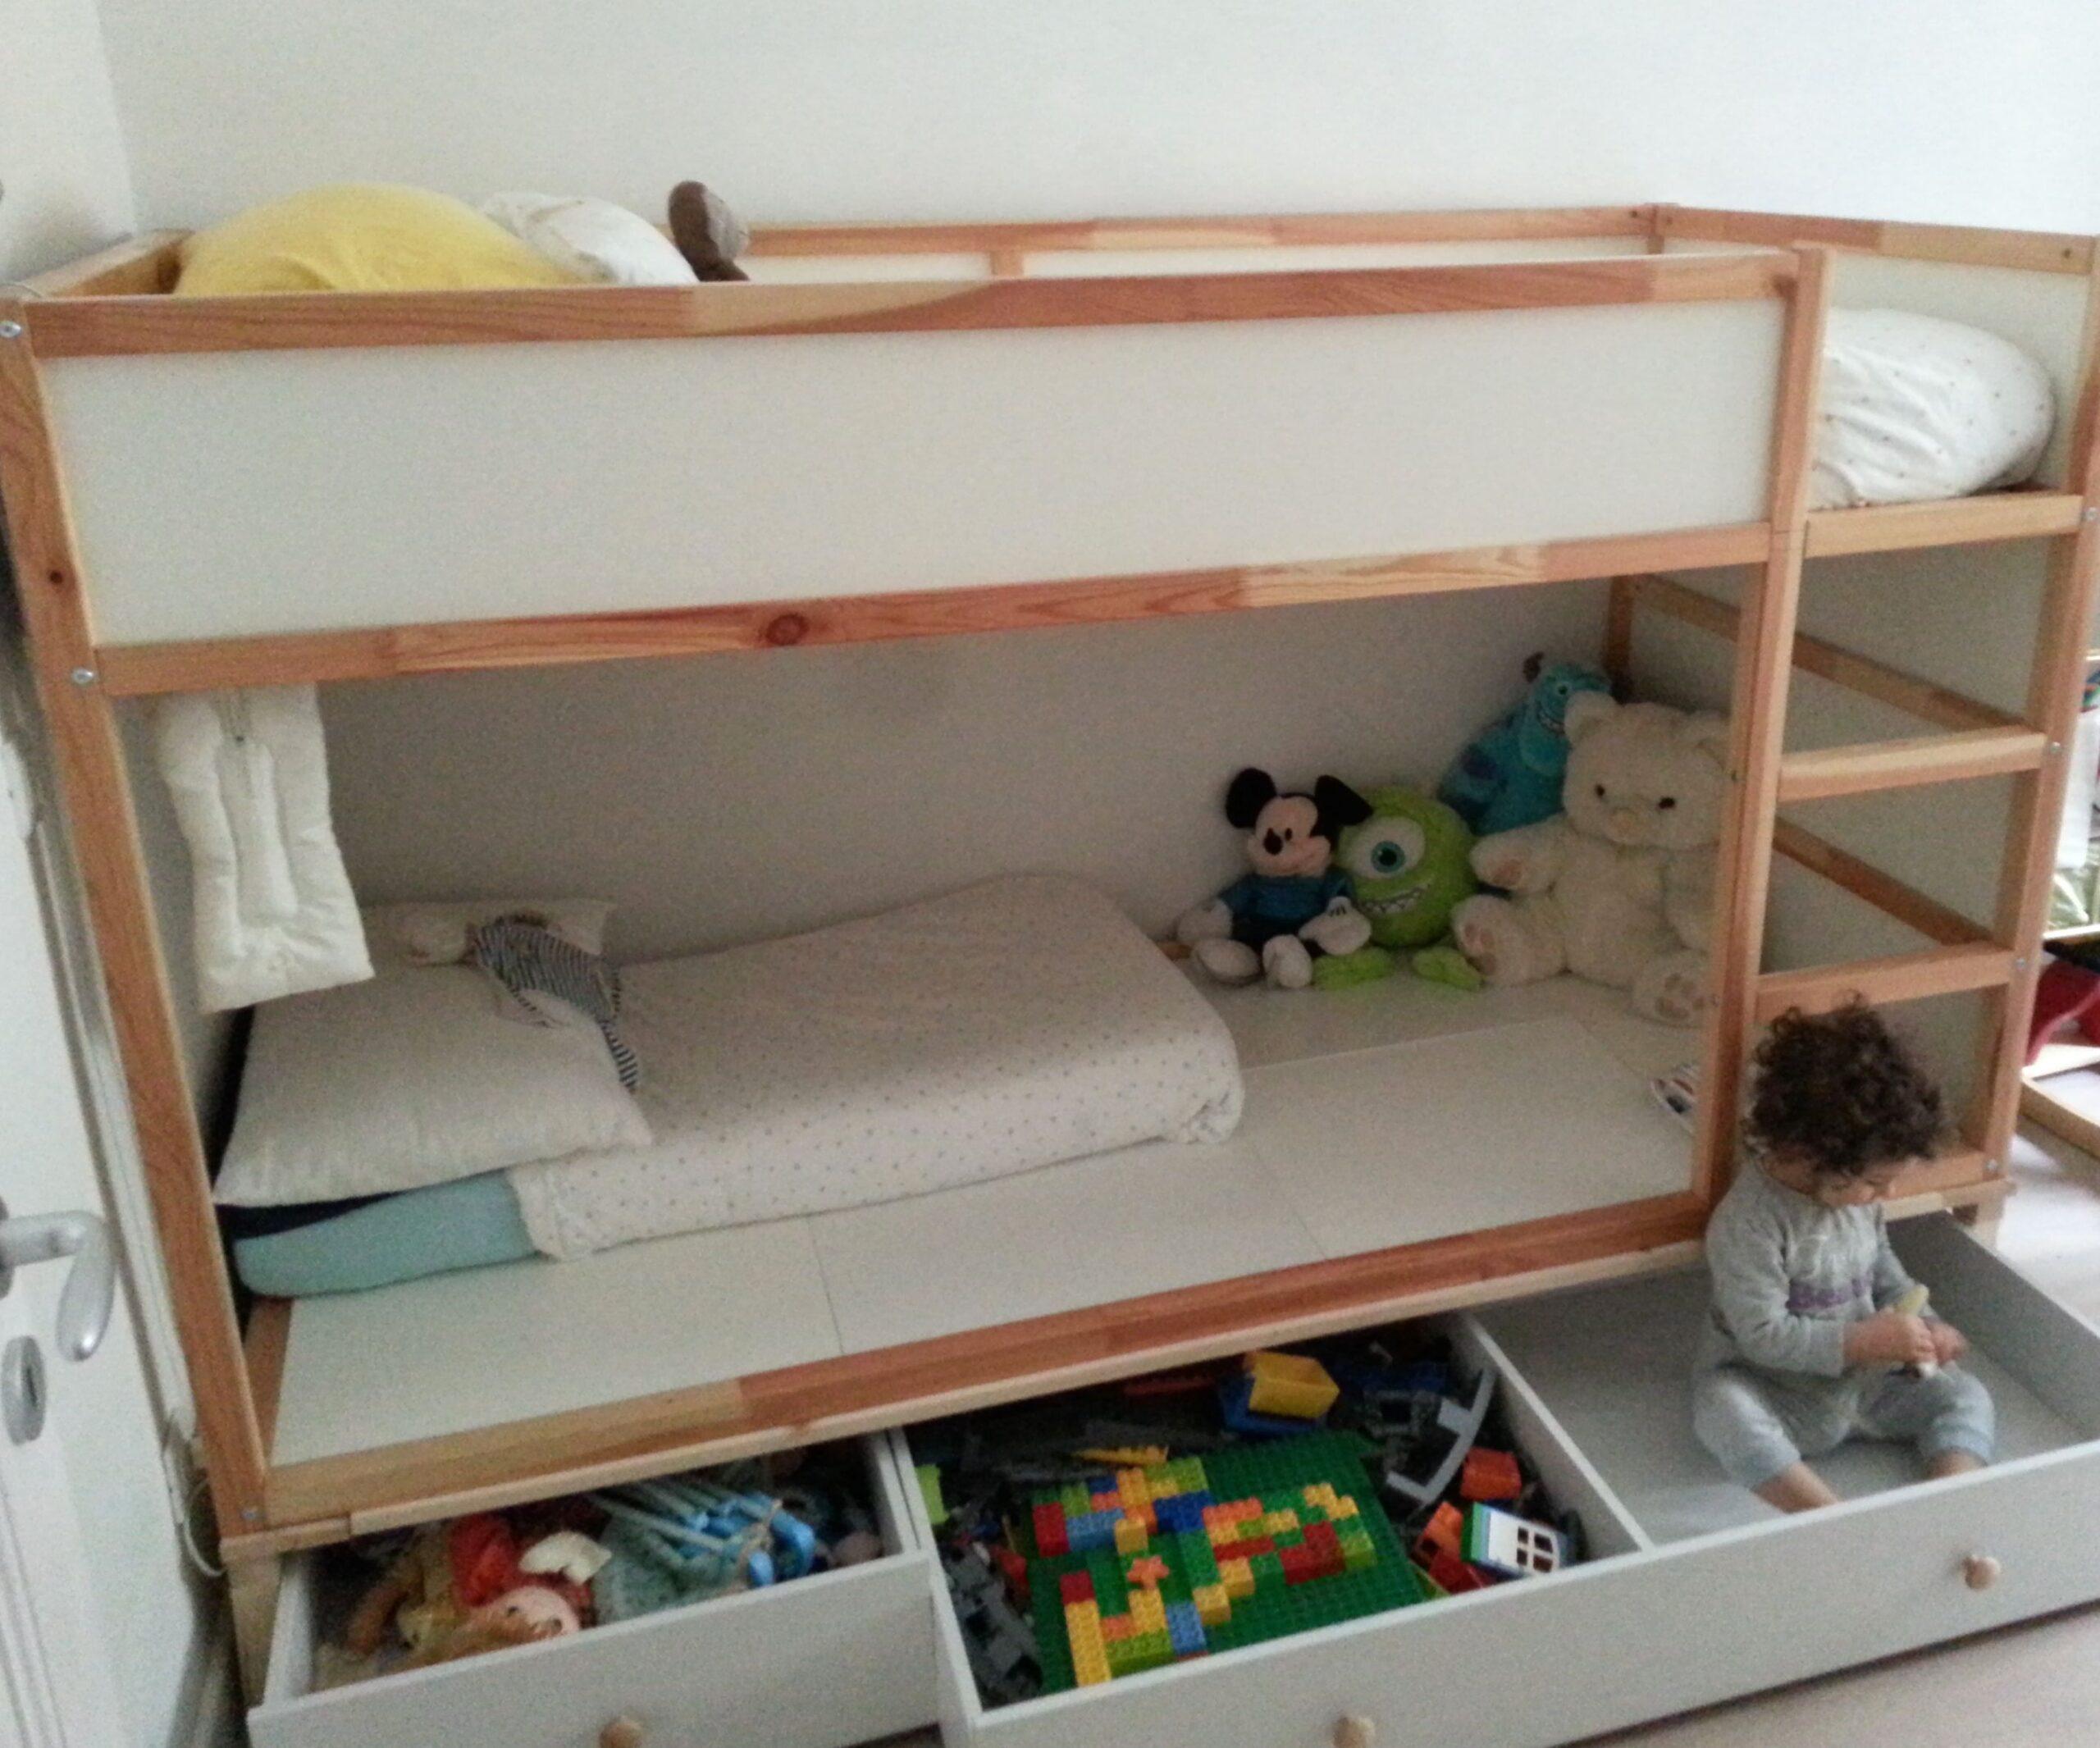 Full Size of Kura Bed Hack Storage Ikea Double Floor Montessori Drawers Bunk Instructions My For Two Gyerekszoba Wohnzimmer Kura Hack